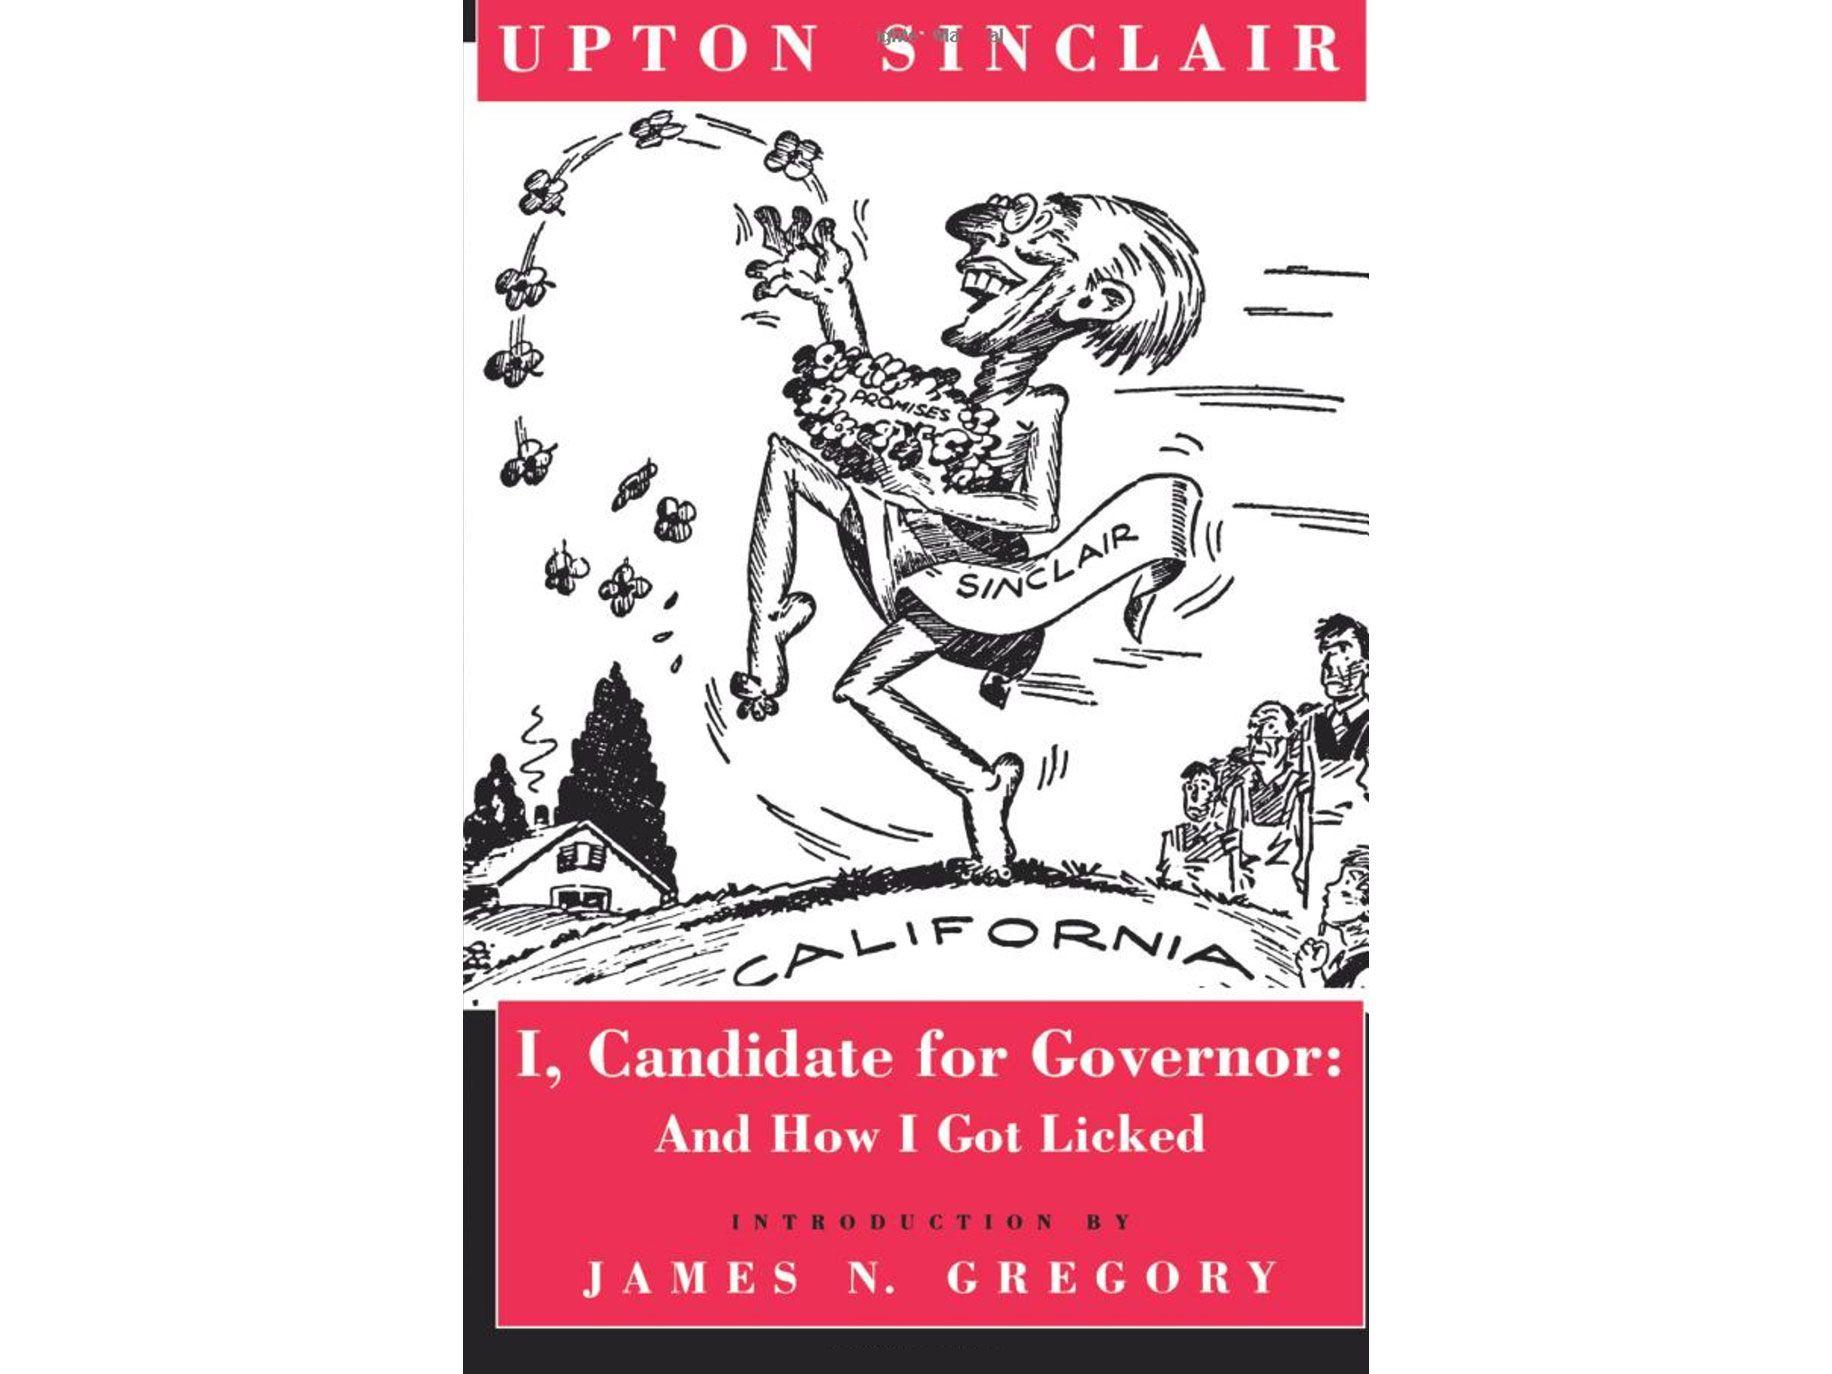 The cover of a 1994 reprint of Upton Sinclair's <em>I, Candidate for Governor: And How I Got Licked</em>.